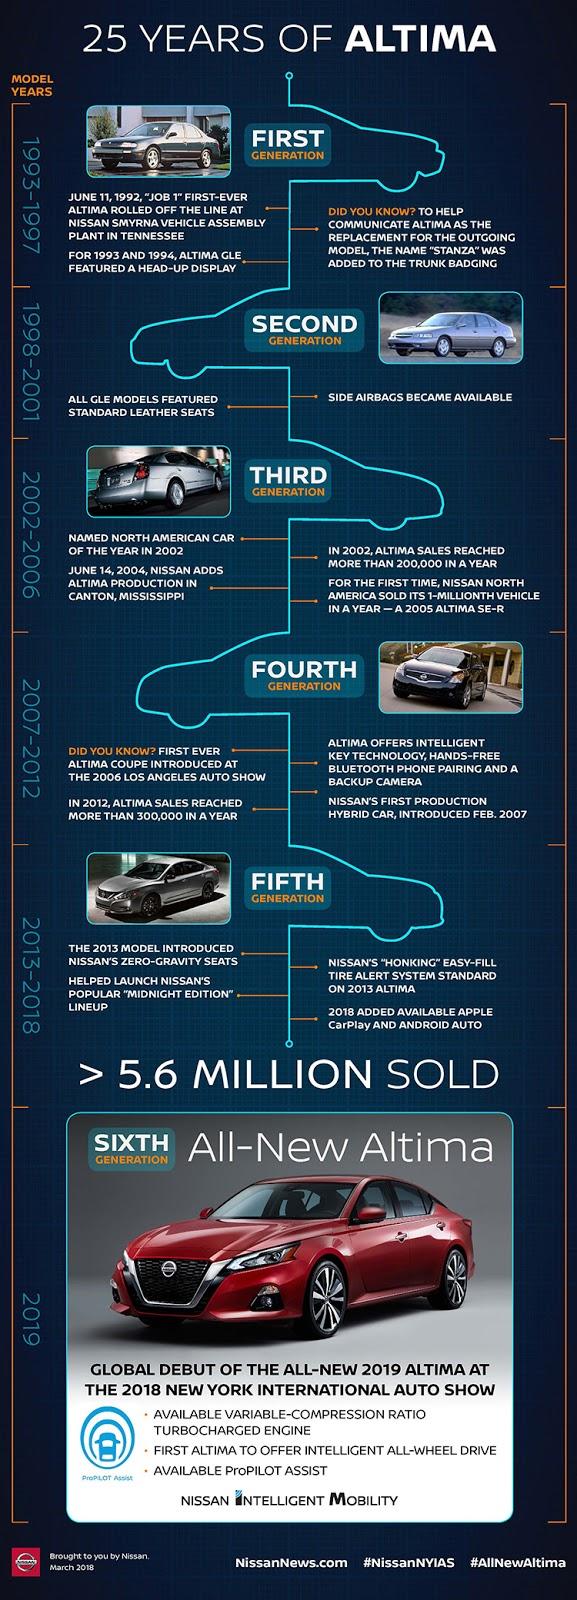 Nissan Altima heritage: five generations, 5.6 million sold